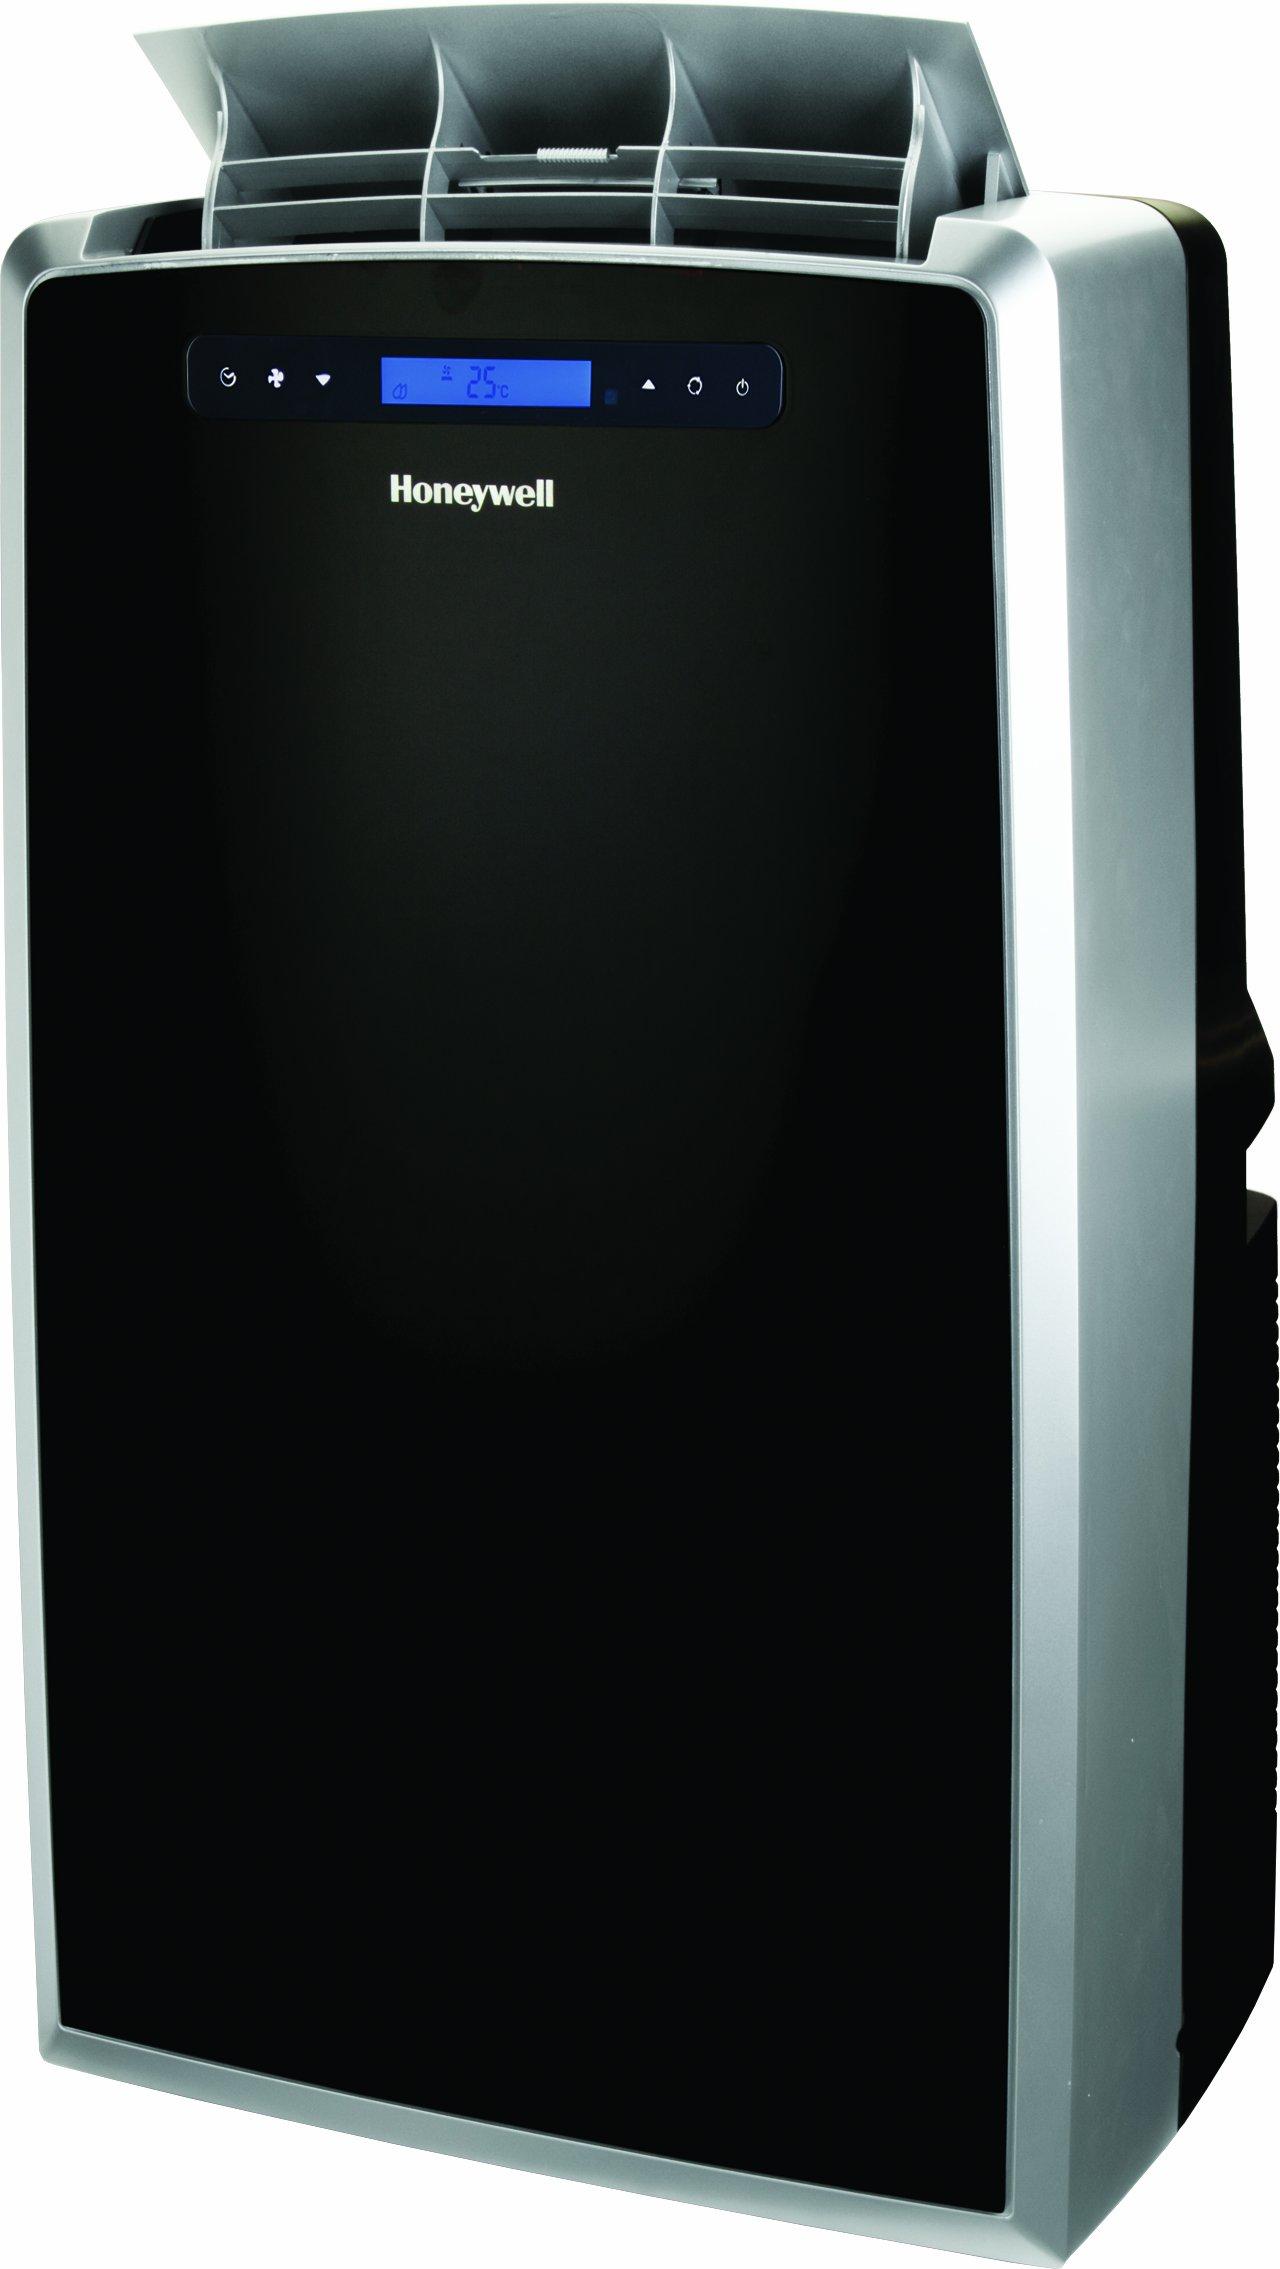 Honeywell Mm14chcs 14,000 Btu Portable Air Conditioner